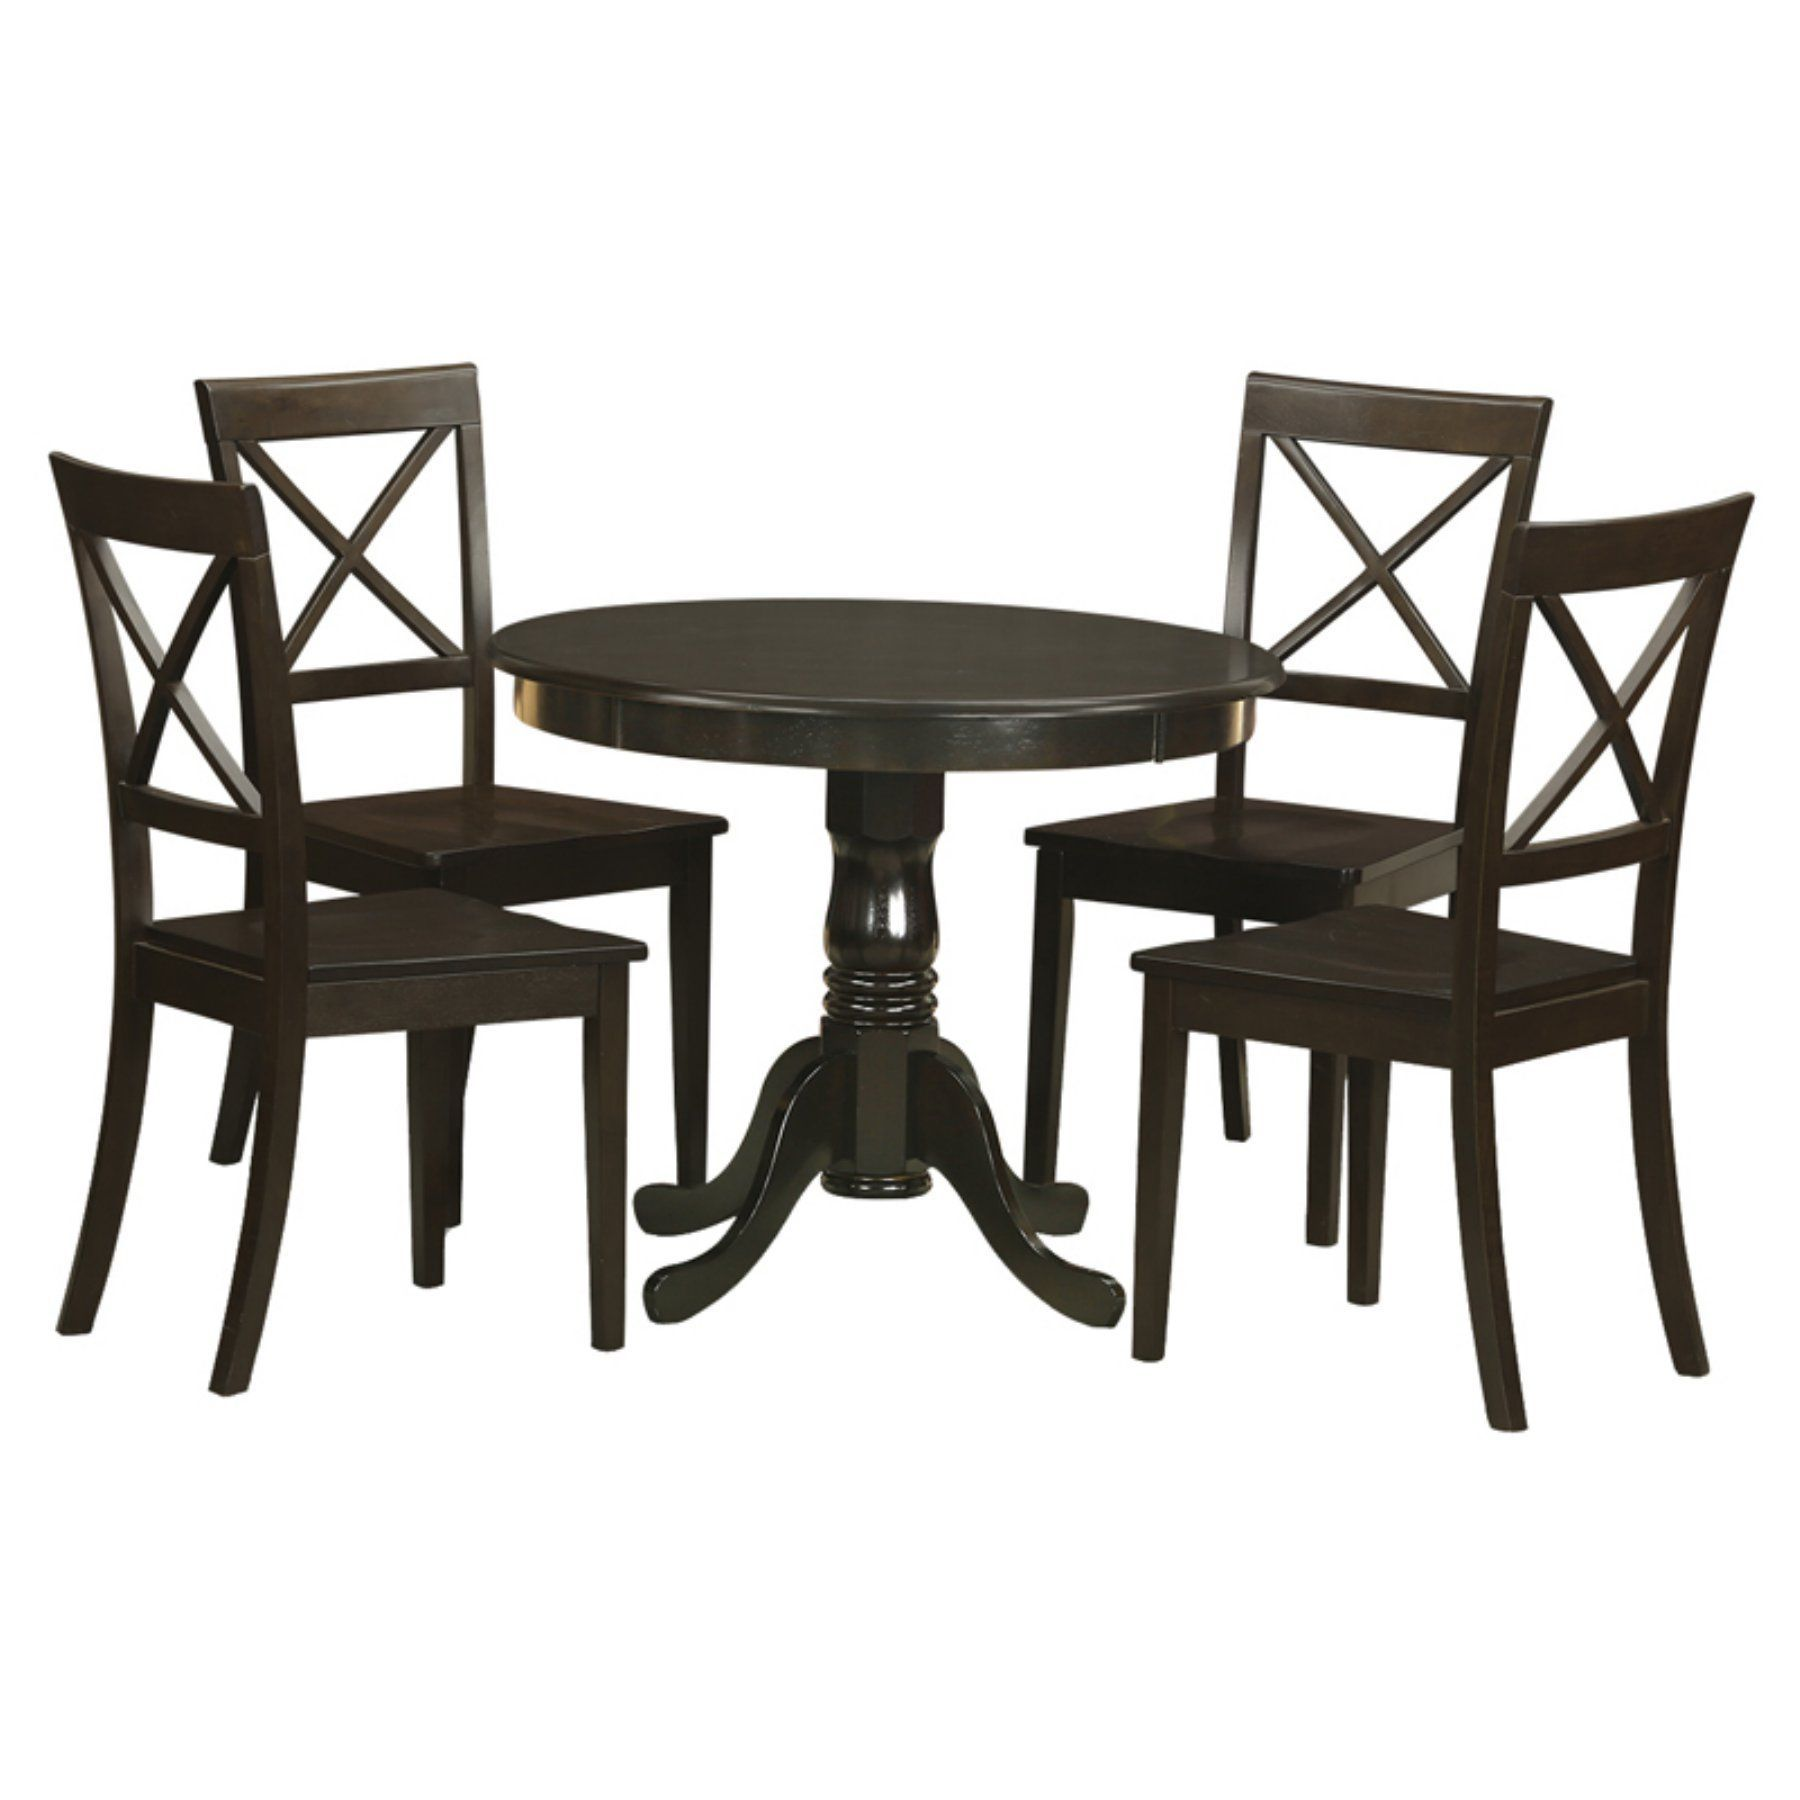 East west furniture antique piece pedestal round dining table set